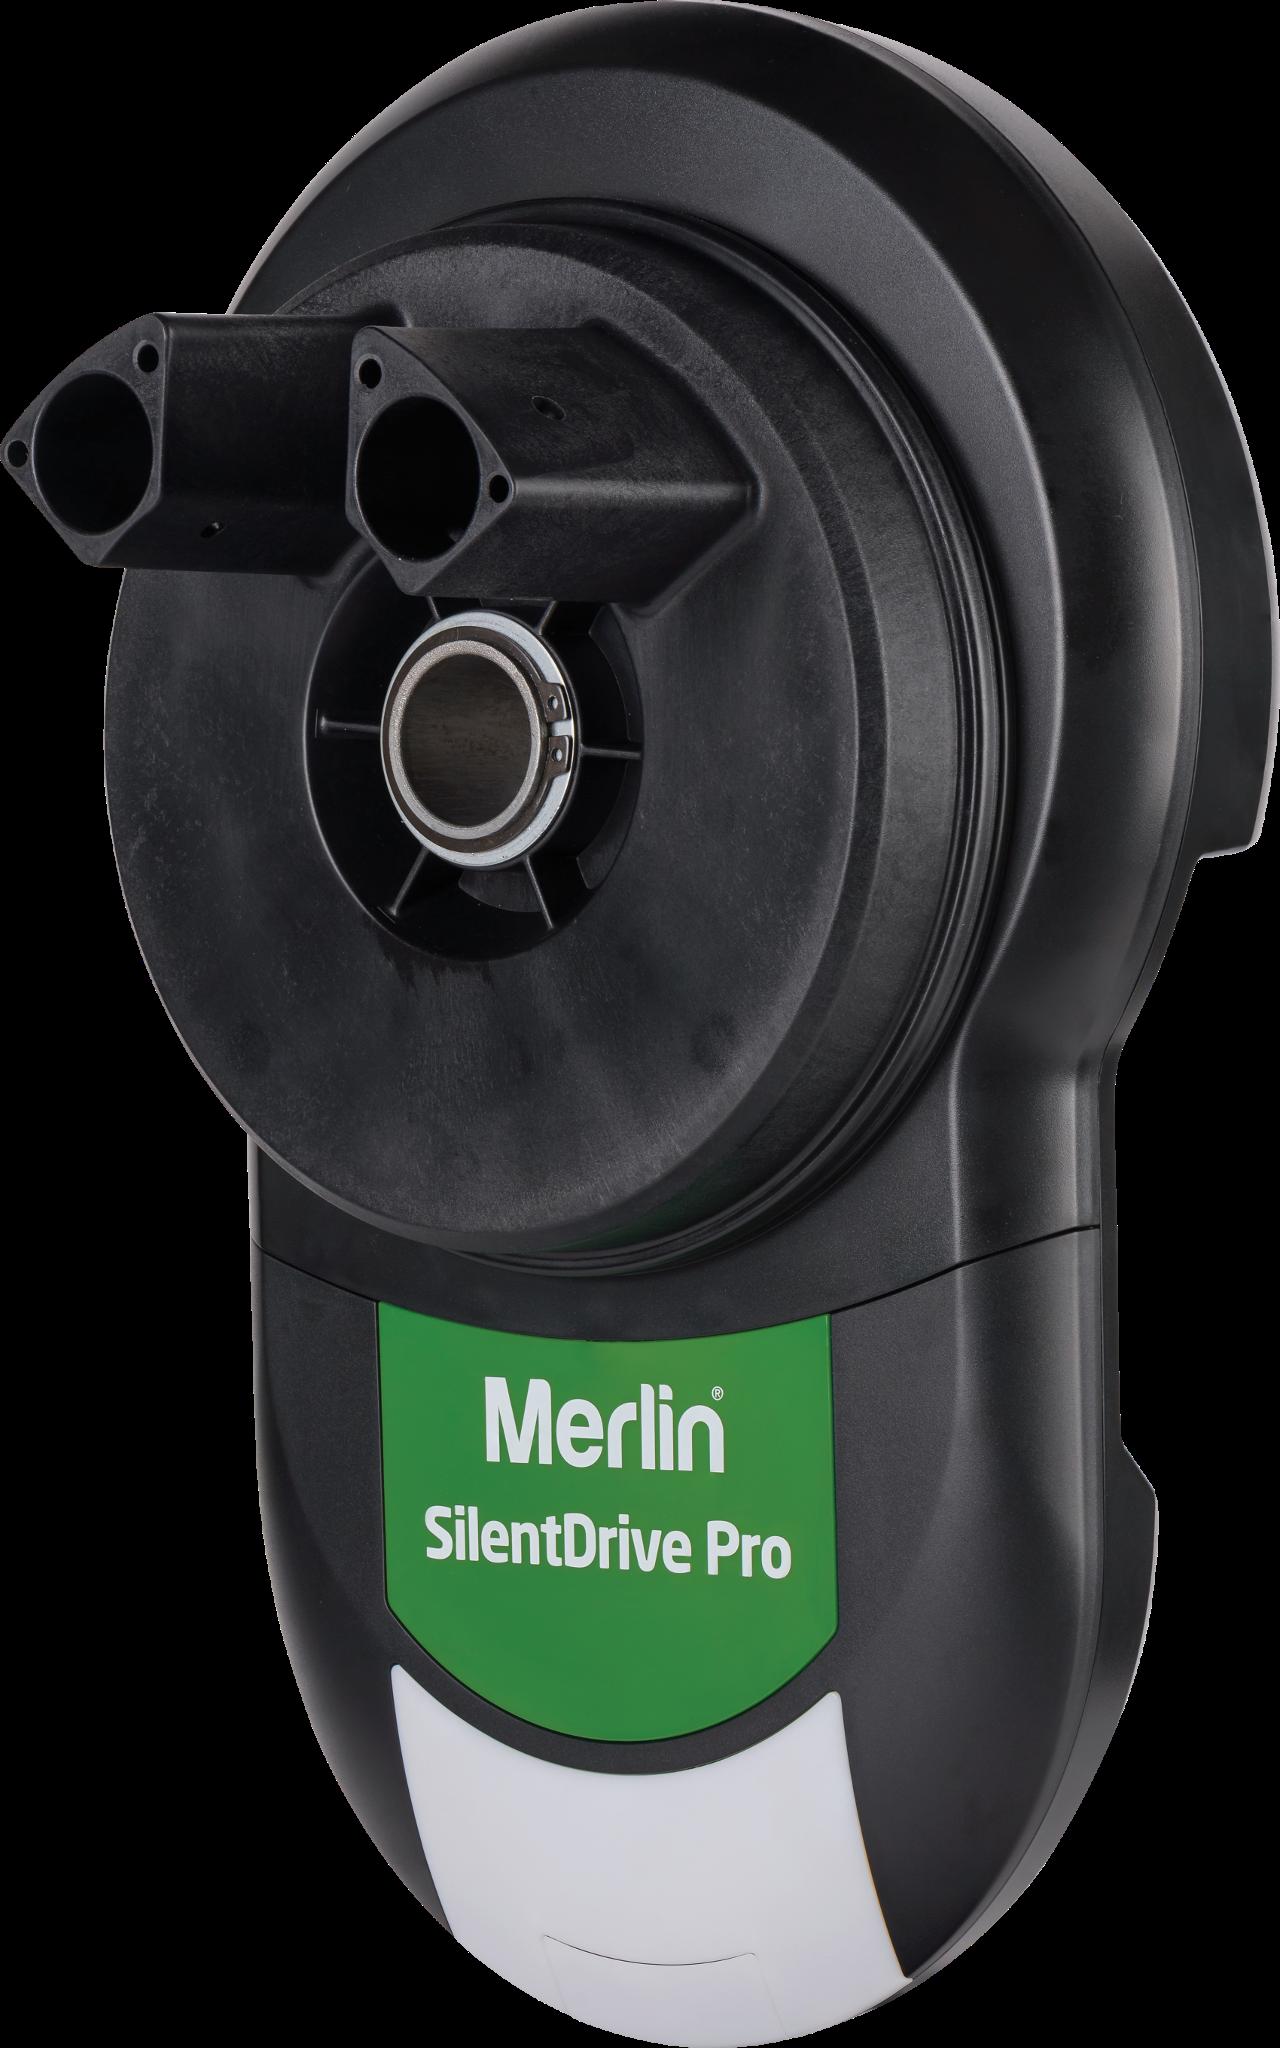 SilentDrive Pro